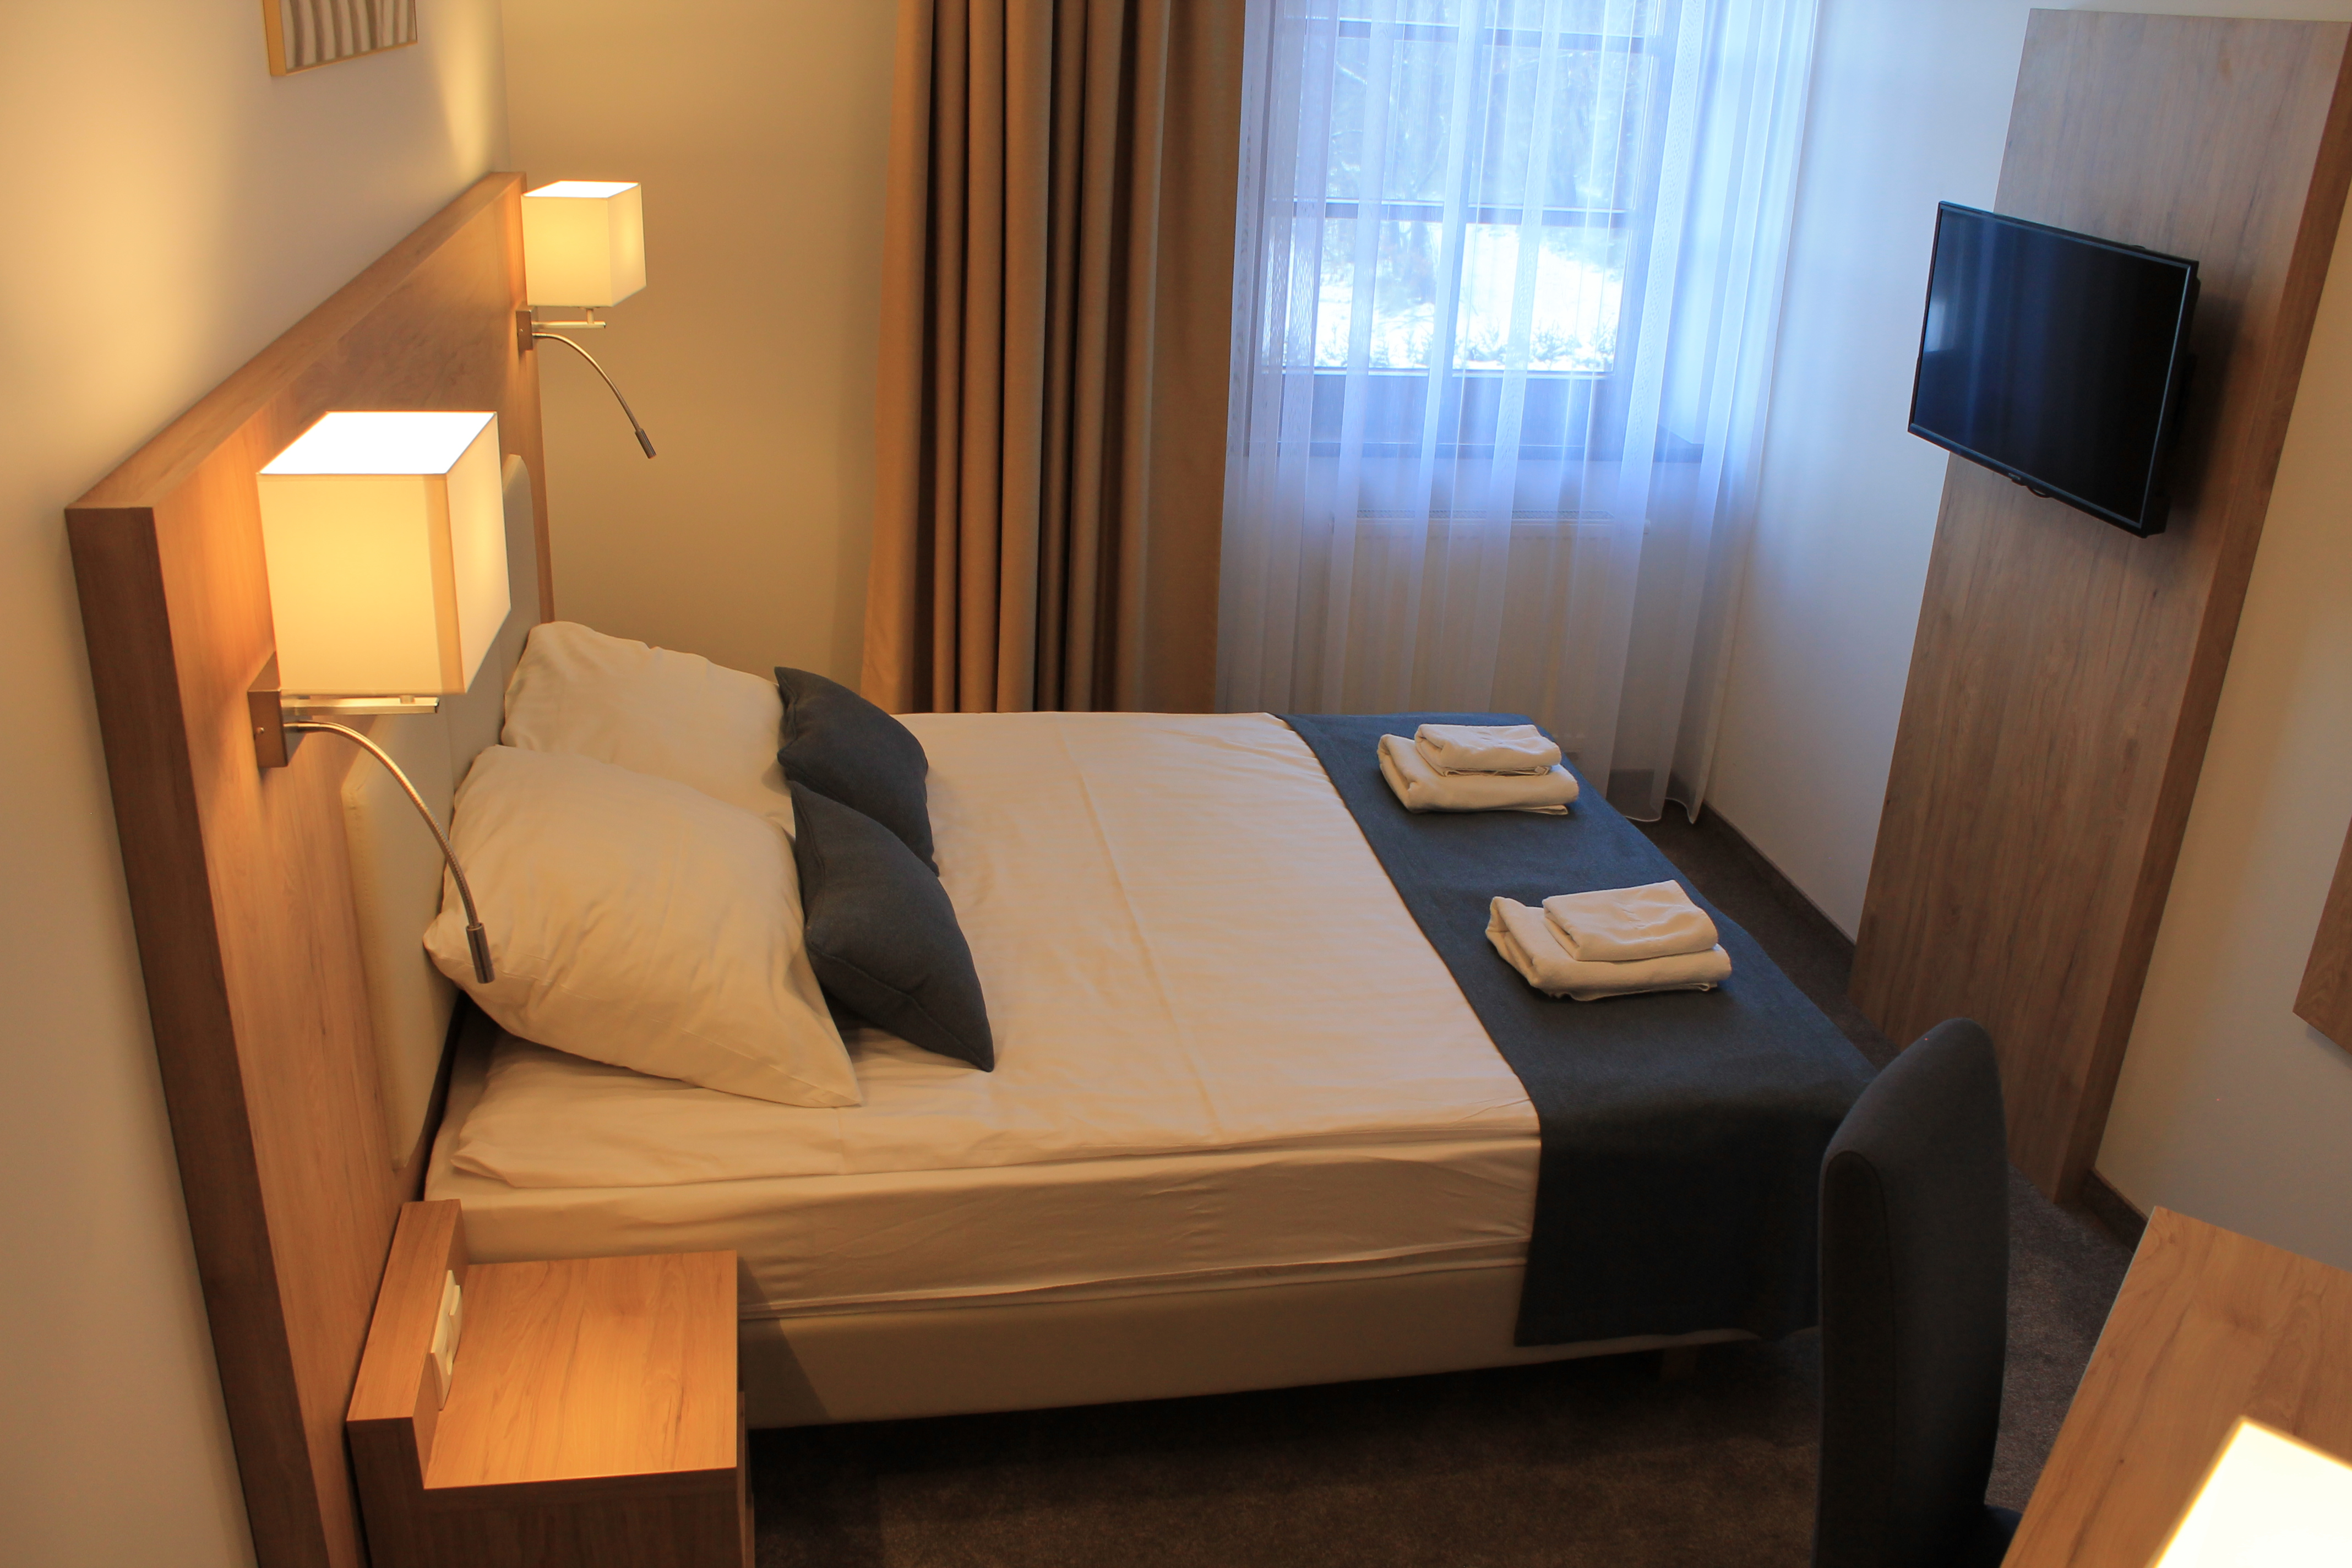 http://www.hotel-lipnica.pl/wp-content/uploads/2020/02/01_03-1.jpg